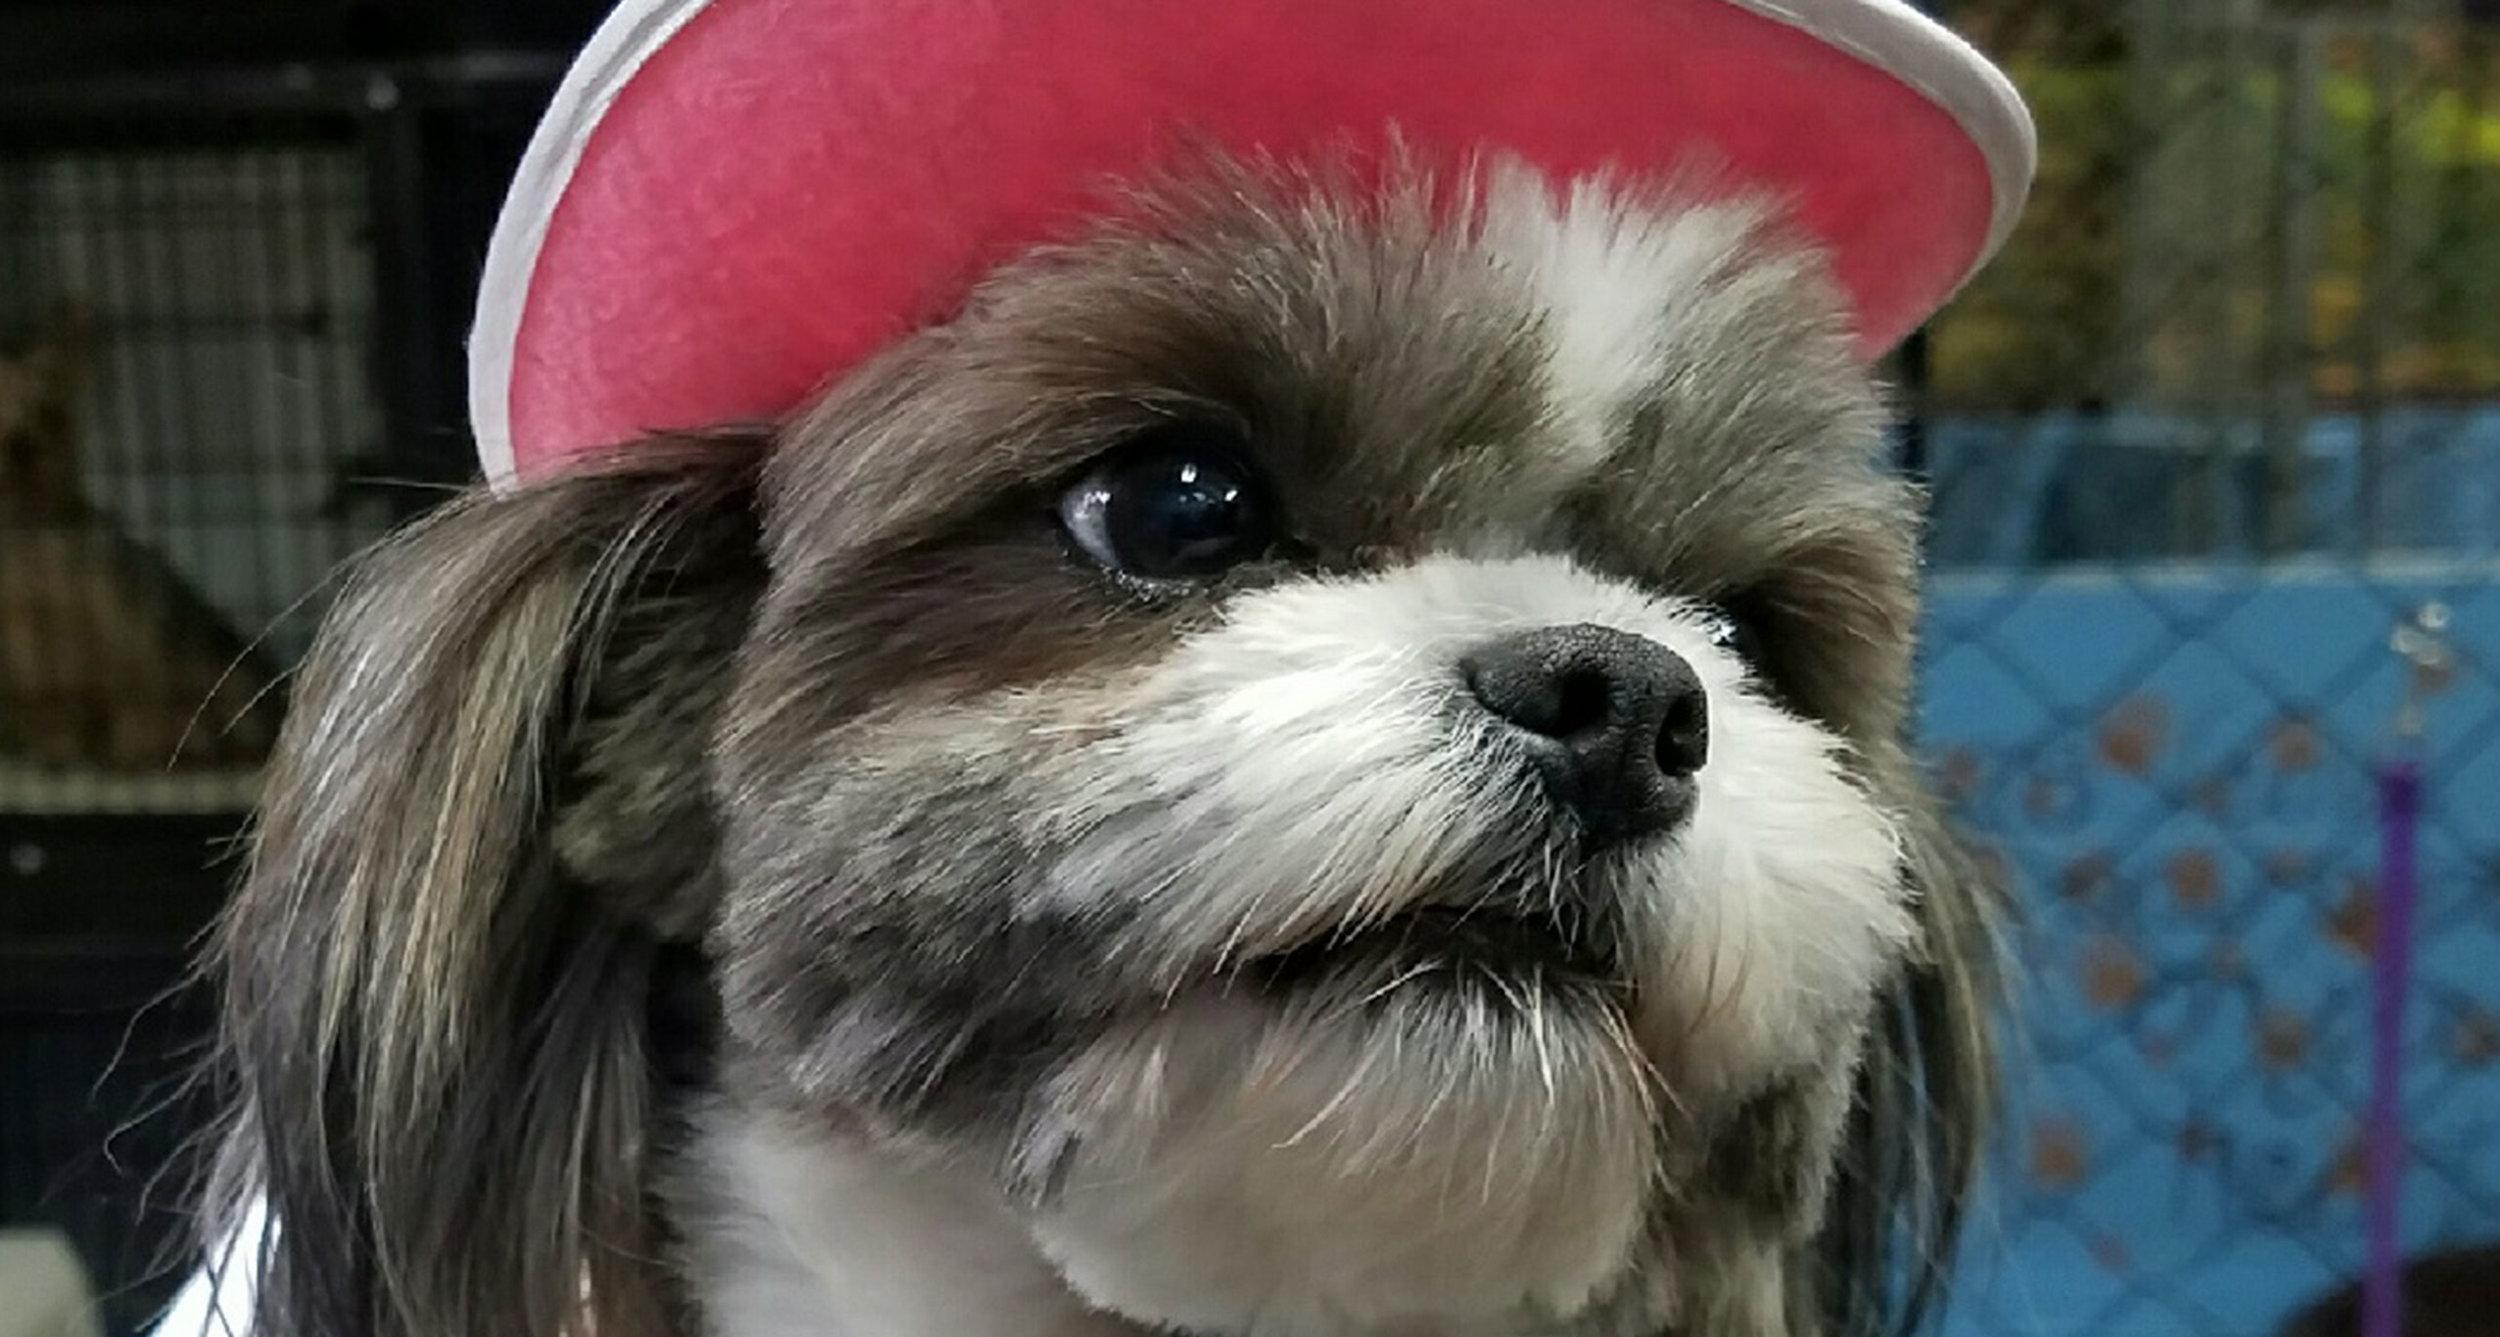 Cute-Hat-Doggy.jpg